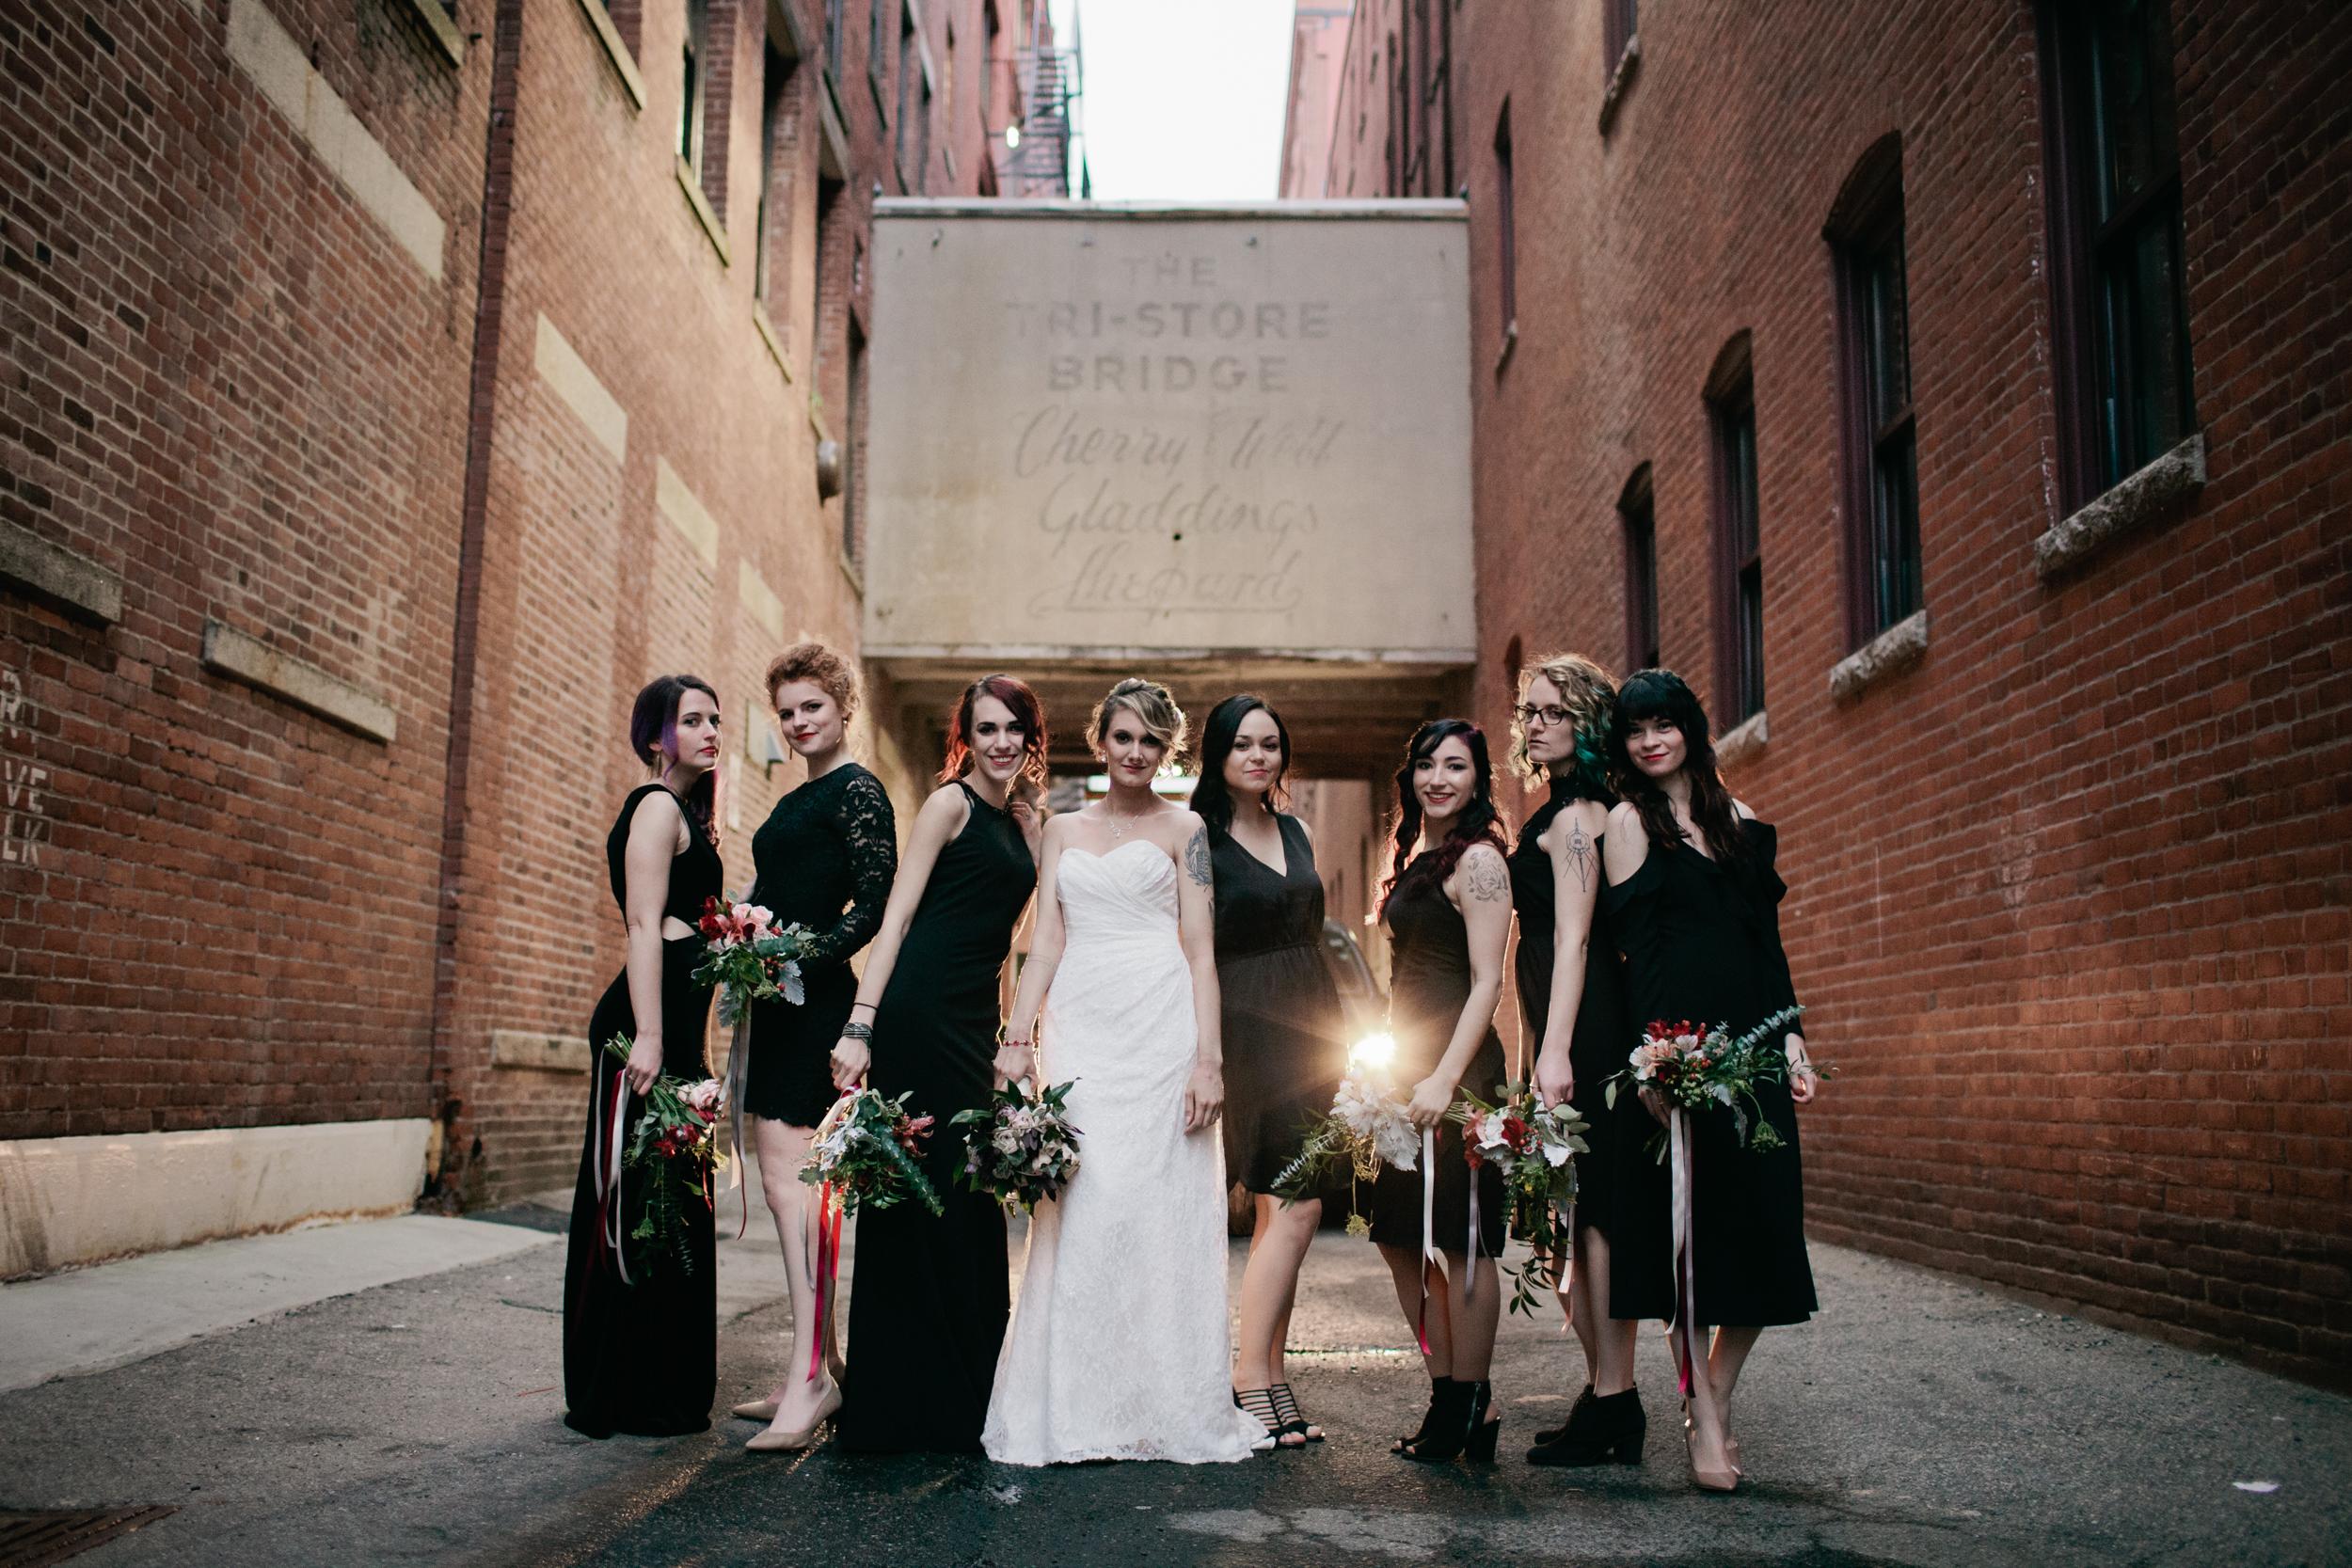 providence-wedding-photographer-116.jpg